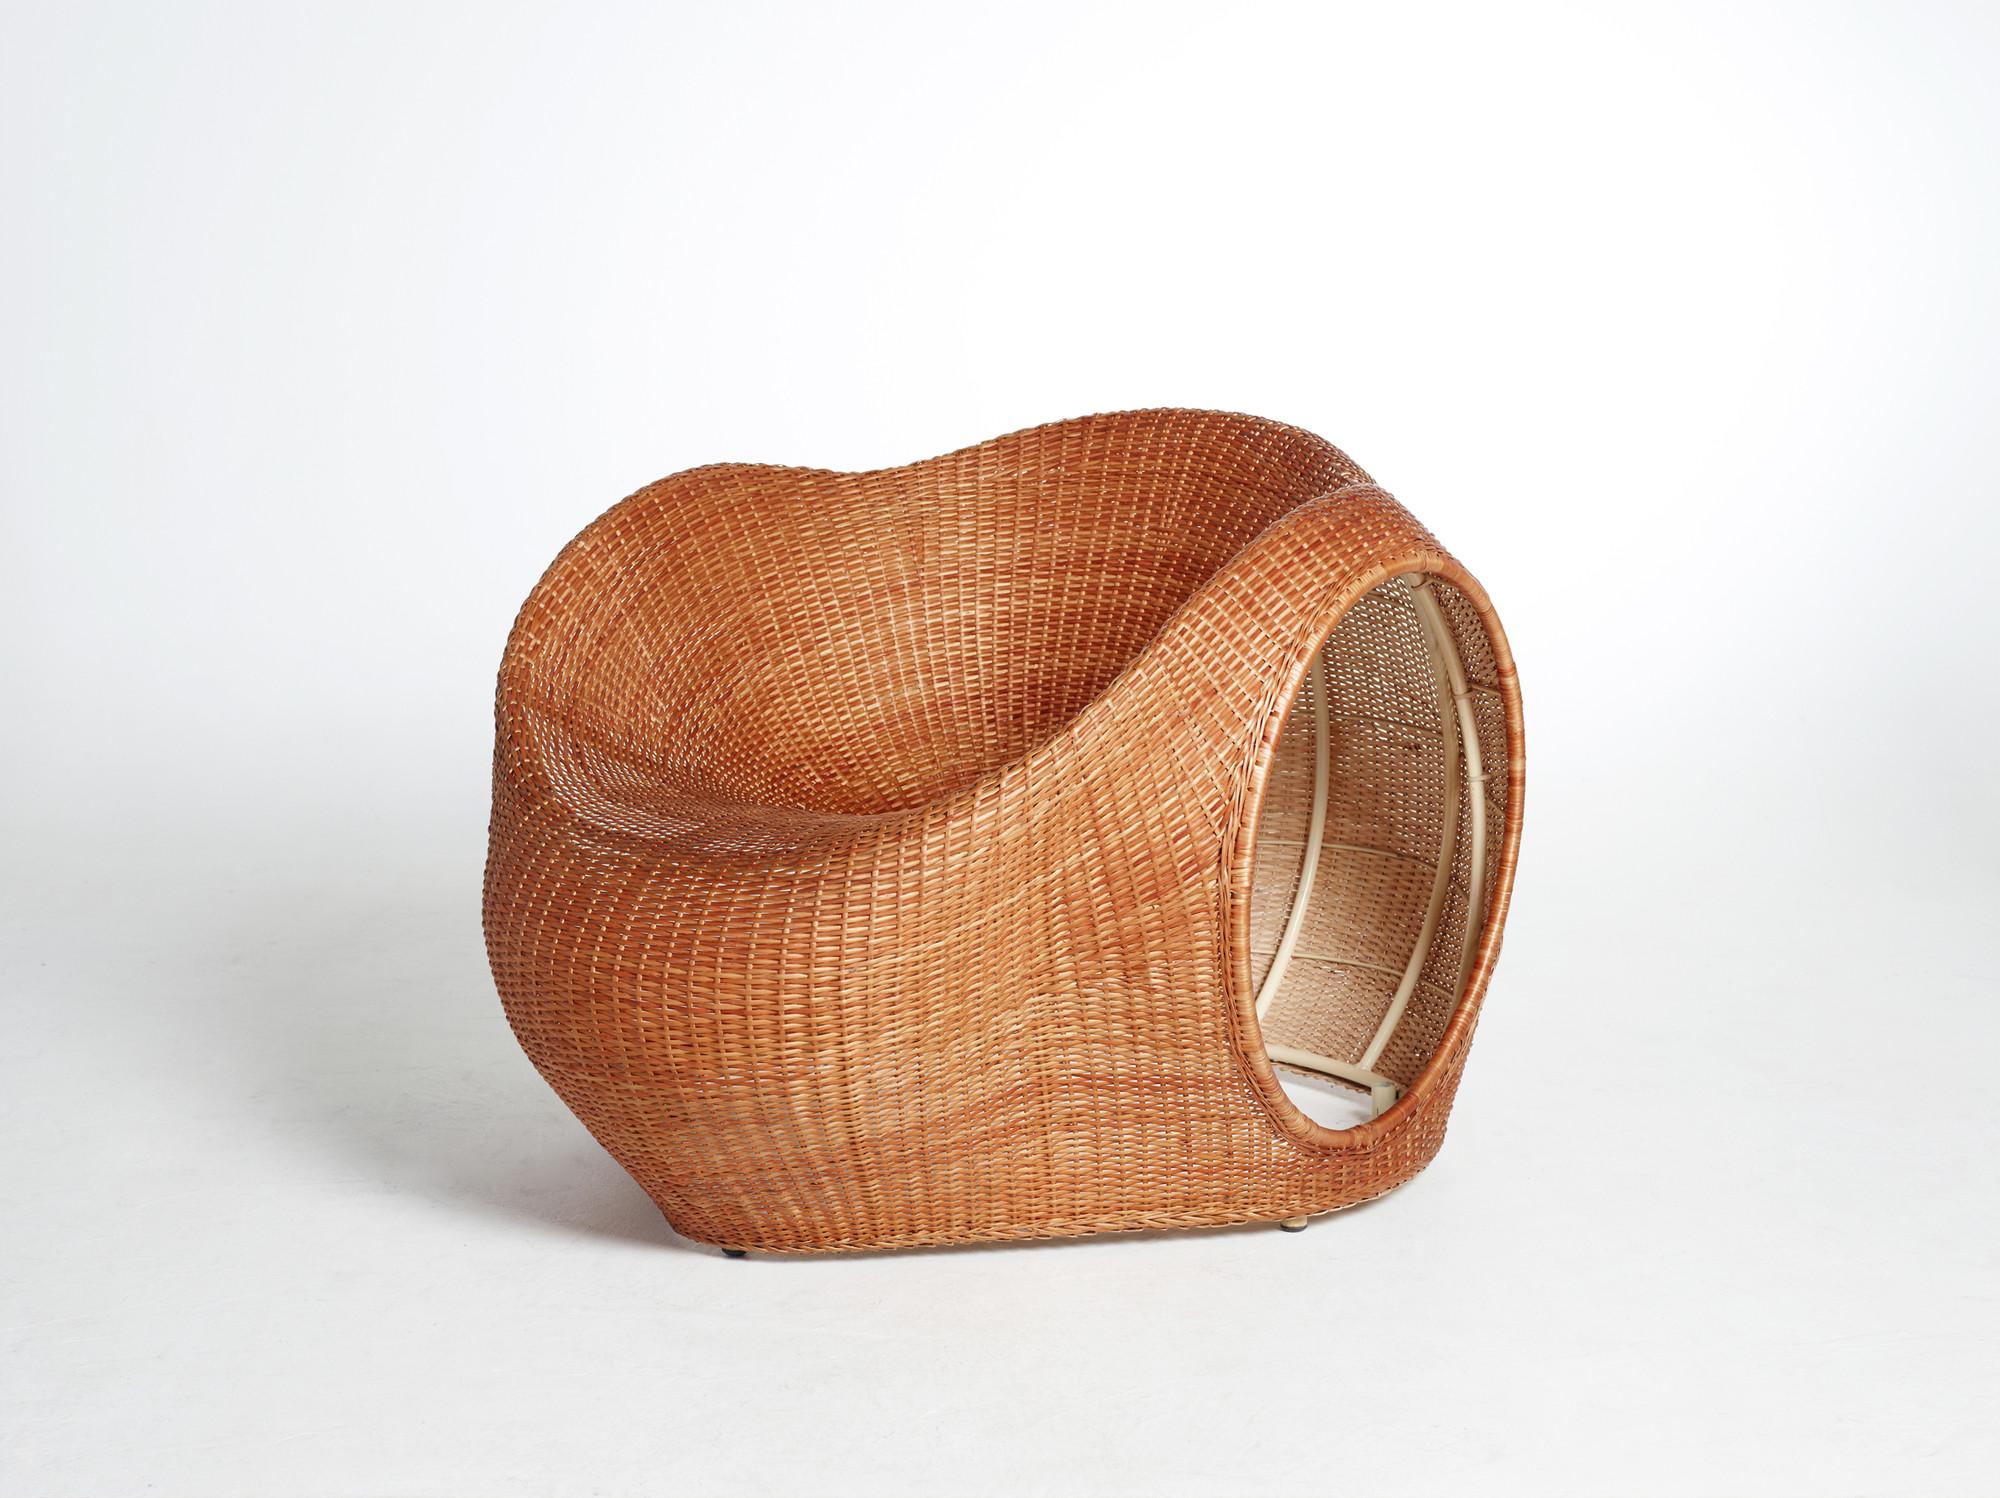 Silla Amalia / Eggpicnic, © Estudio Paolo Remedy